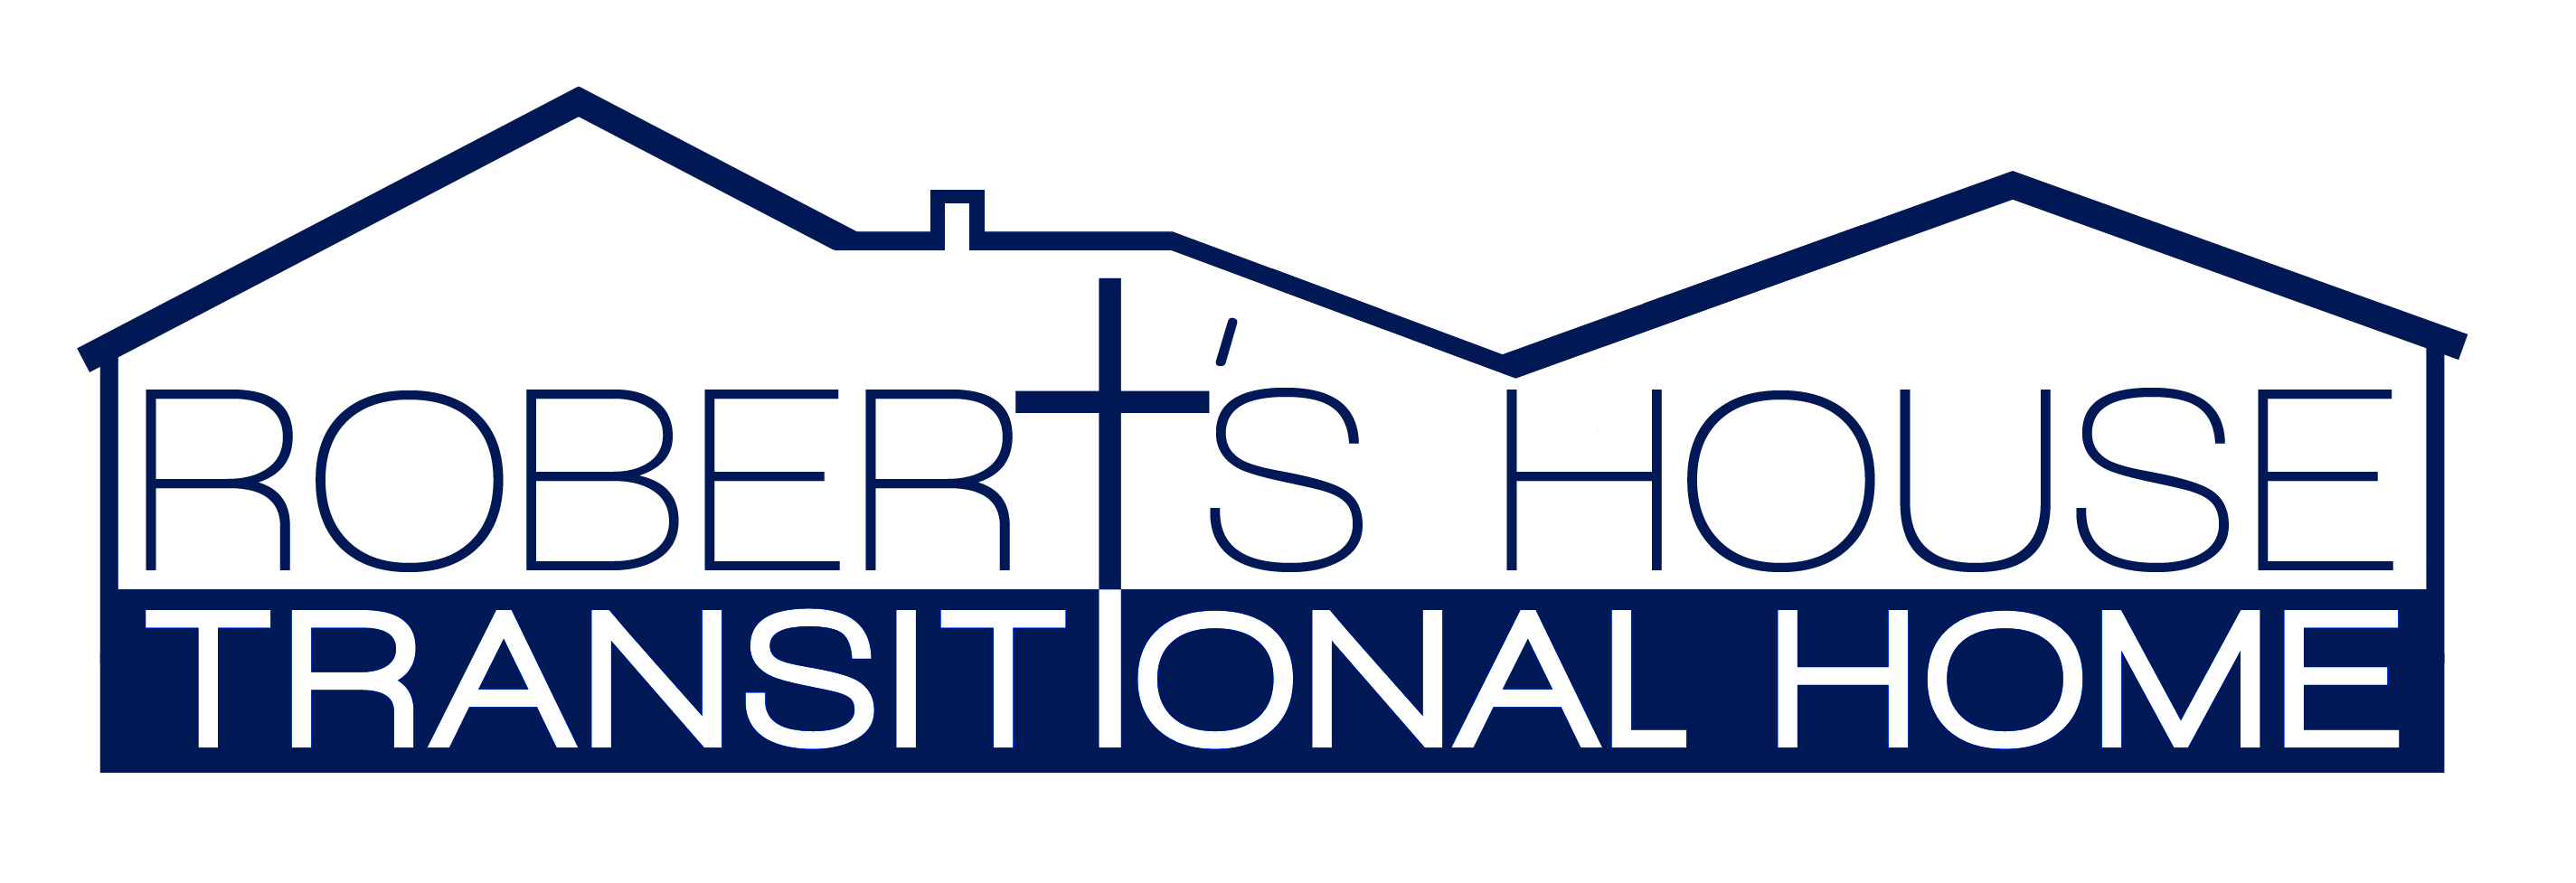 HOF - Roberts_House_logo.png